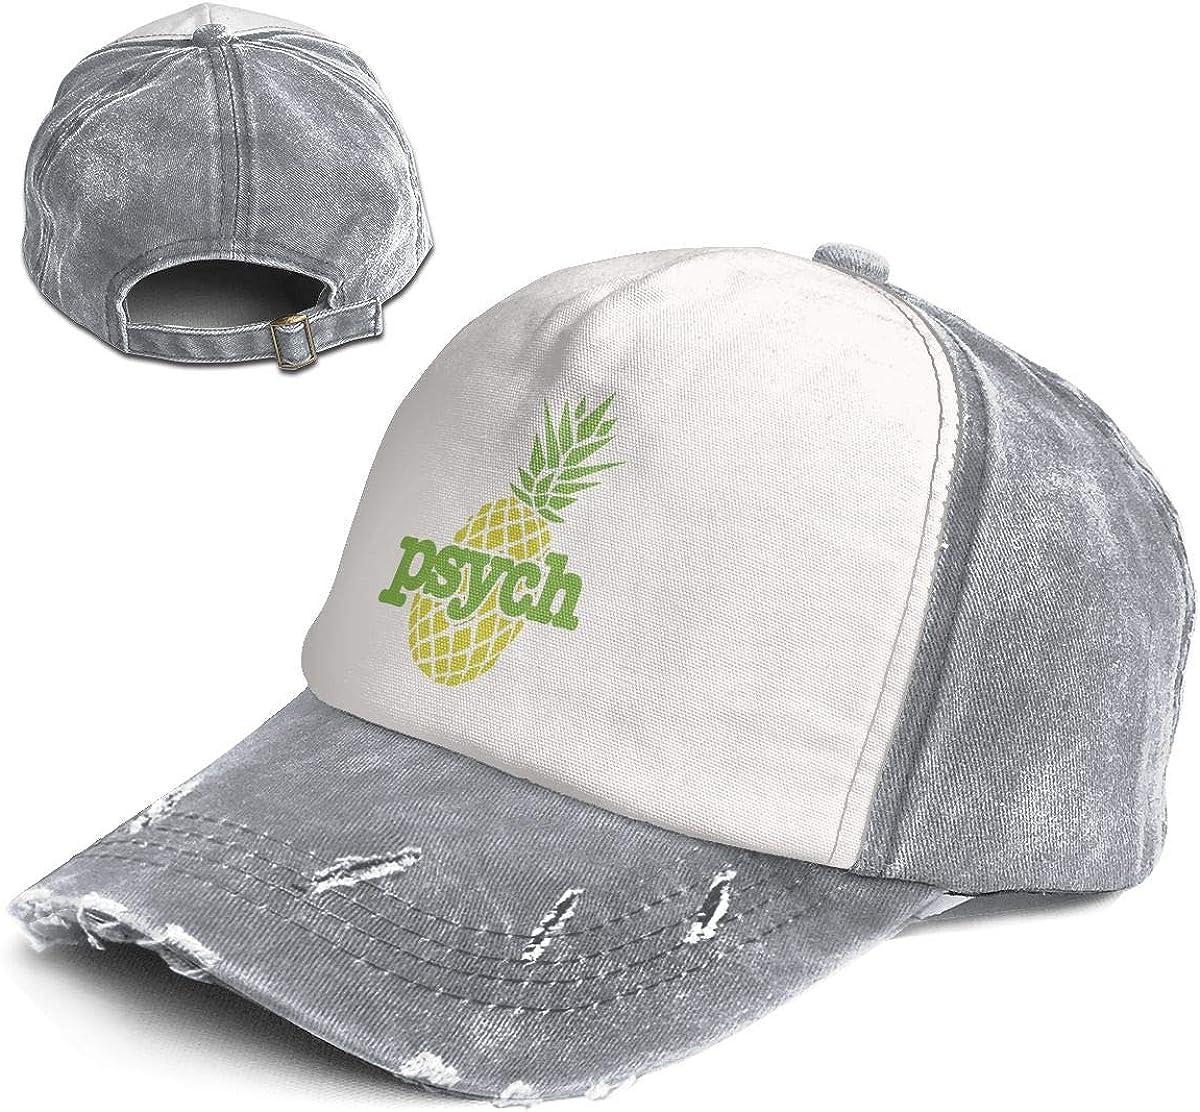 Fashion Vintage Hat Psych Pineapple Adjustable Dad Hat Baseball Cowboy Cap